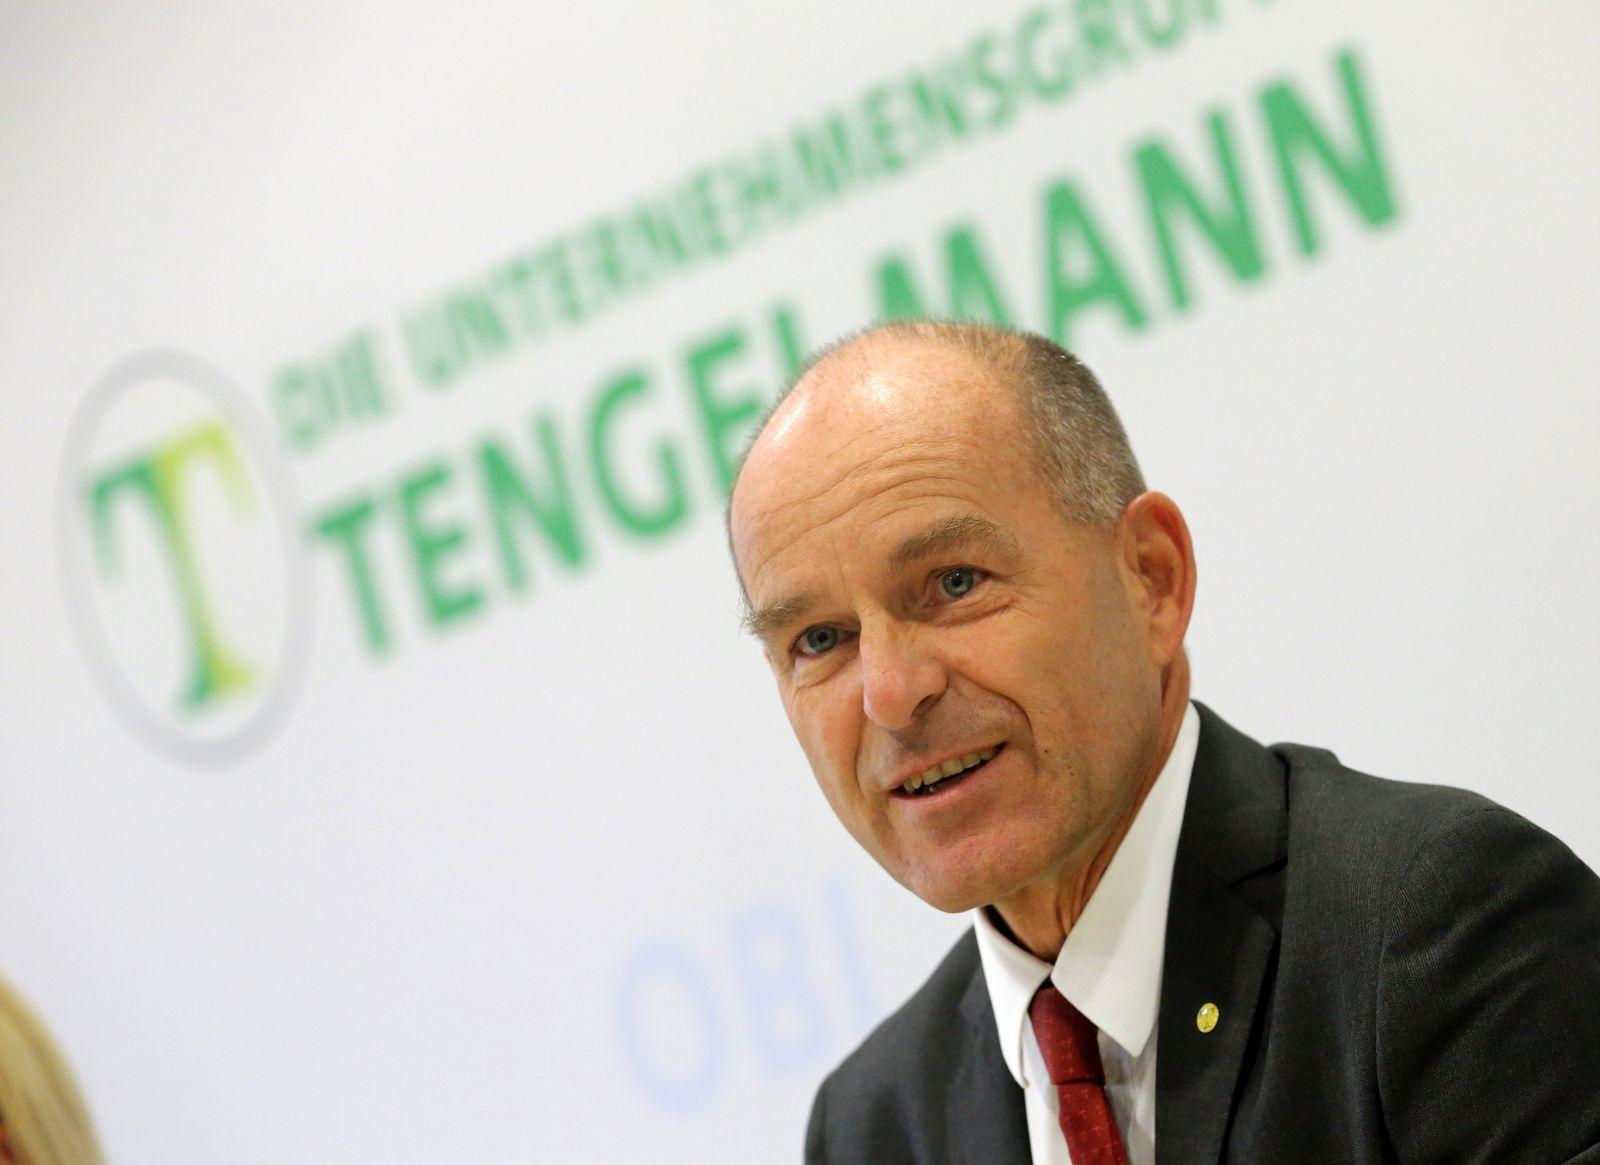 Tengelmann / Karl-Erivan Haub